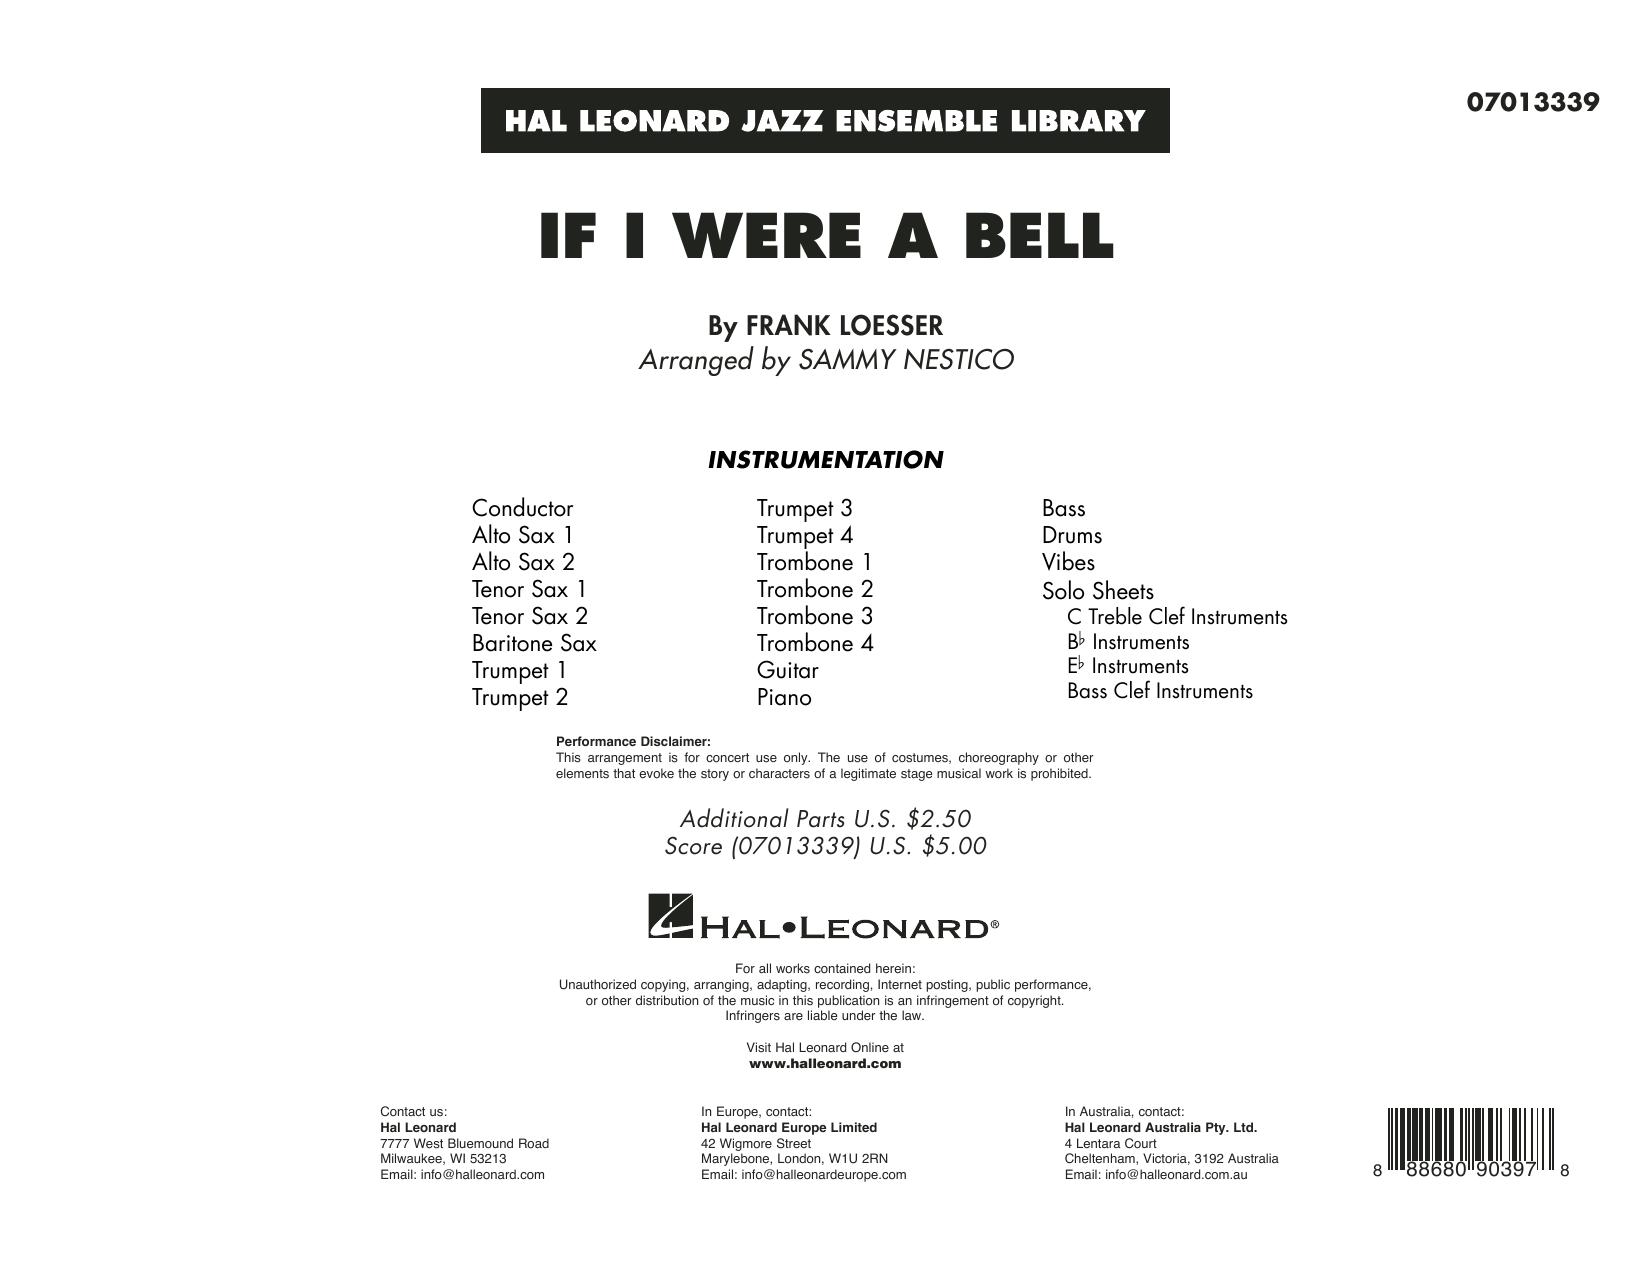 If I Were a Bell (arr. Sammy Nestico) - Conductor Score (Full Score) (Jazz Ensemble)